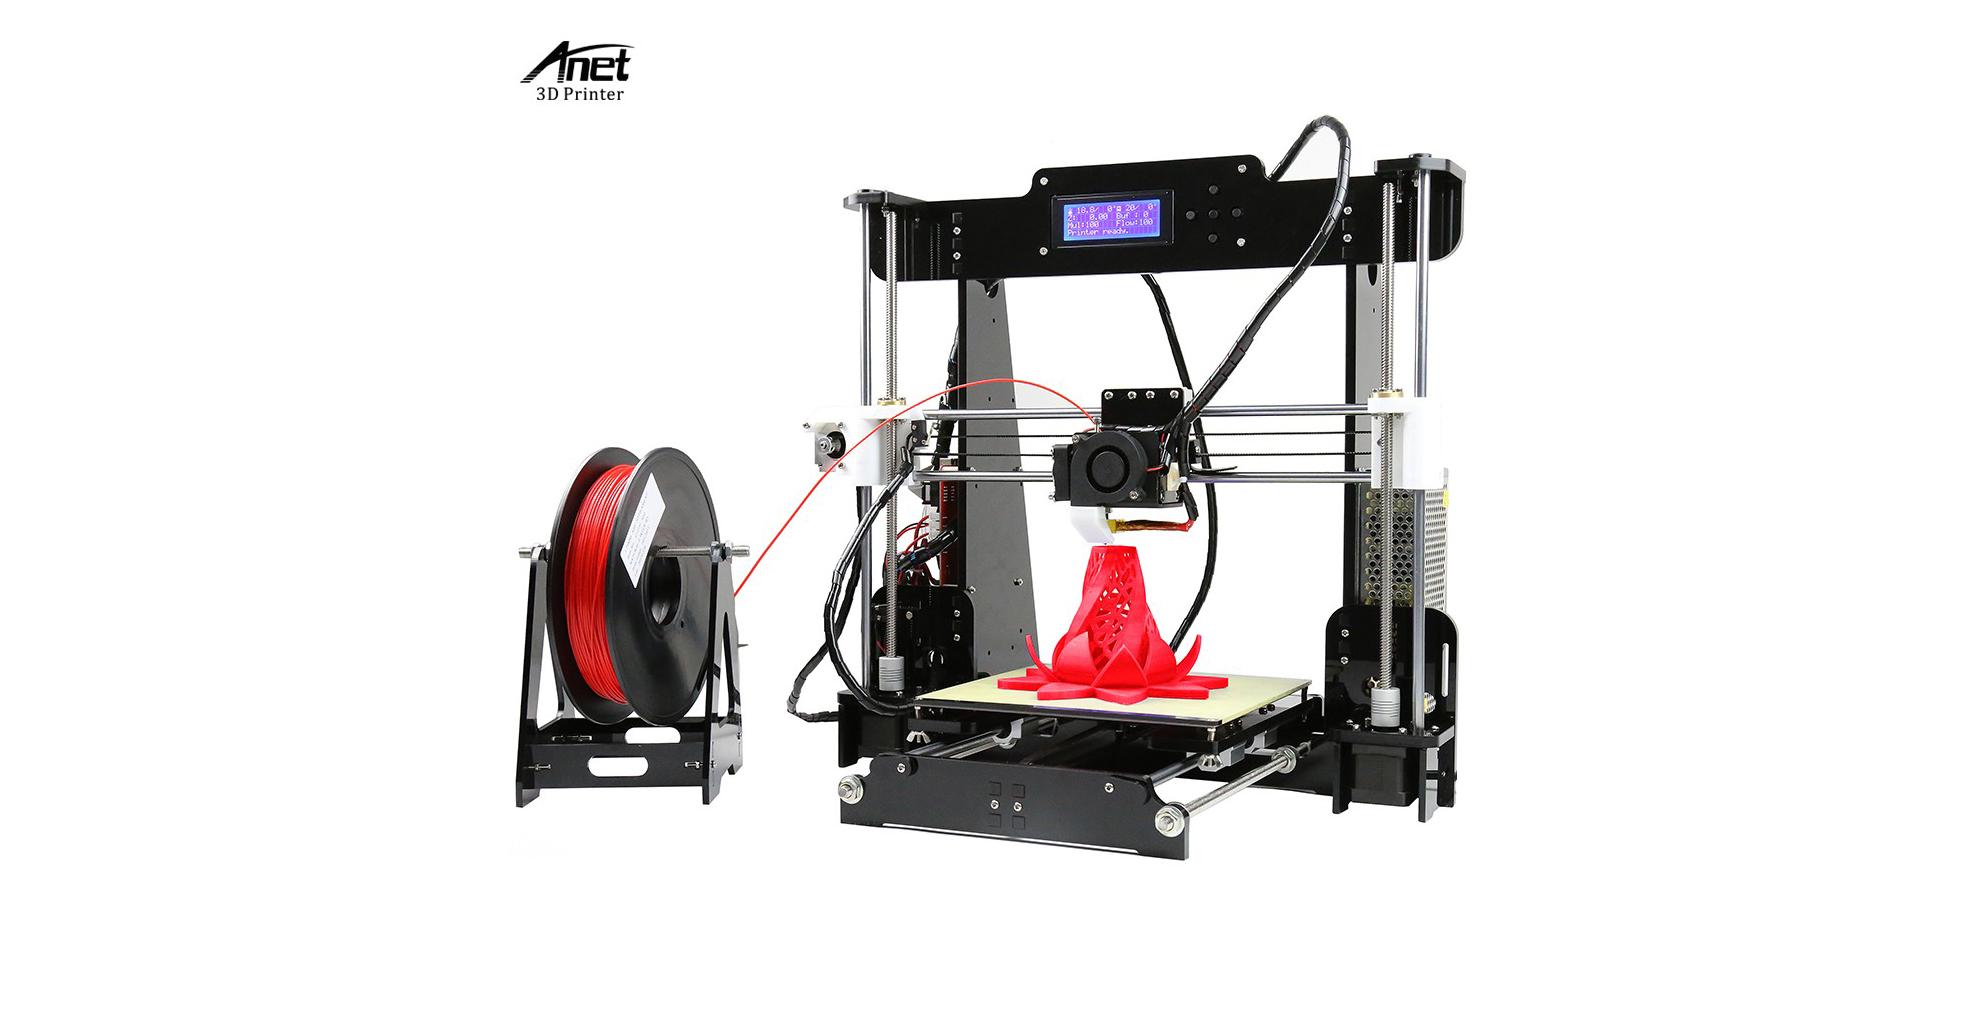 3D tiskárna Anet A8 za hubičku! [sponzorovaný článek]